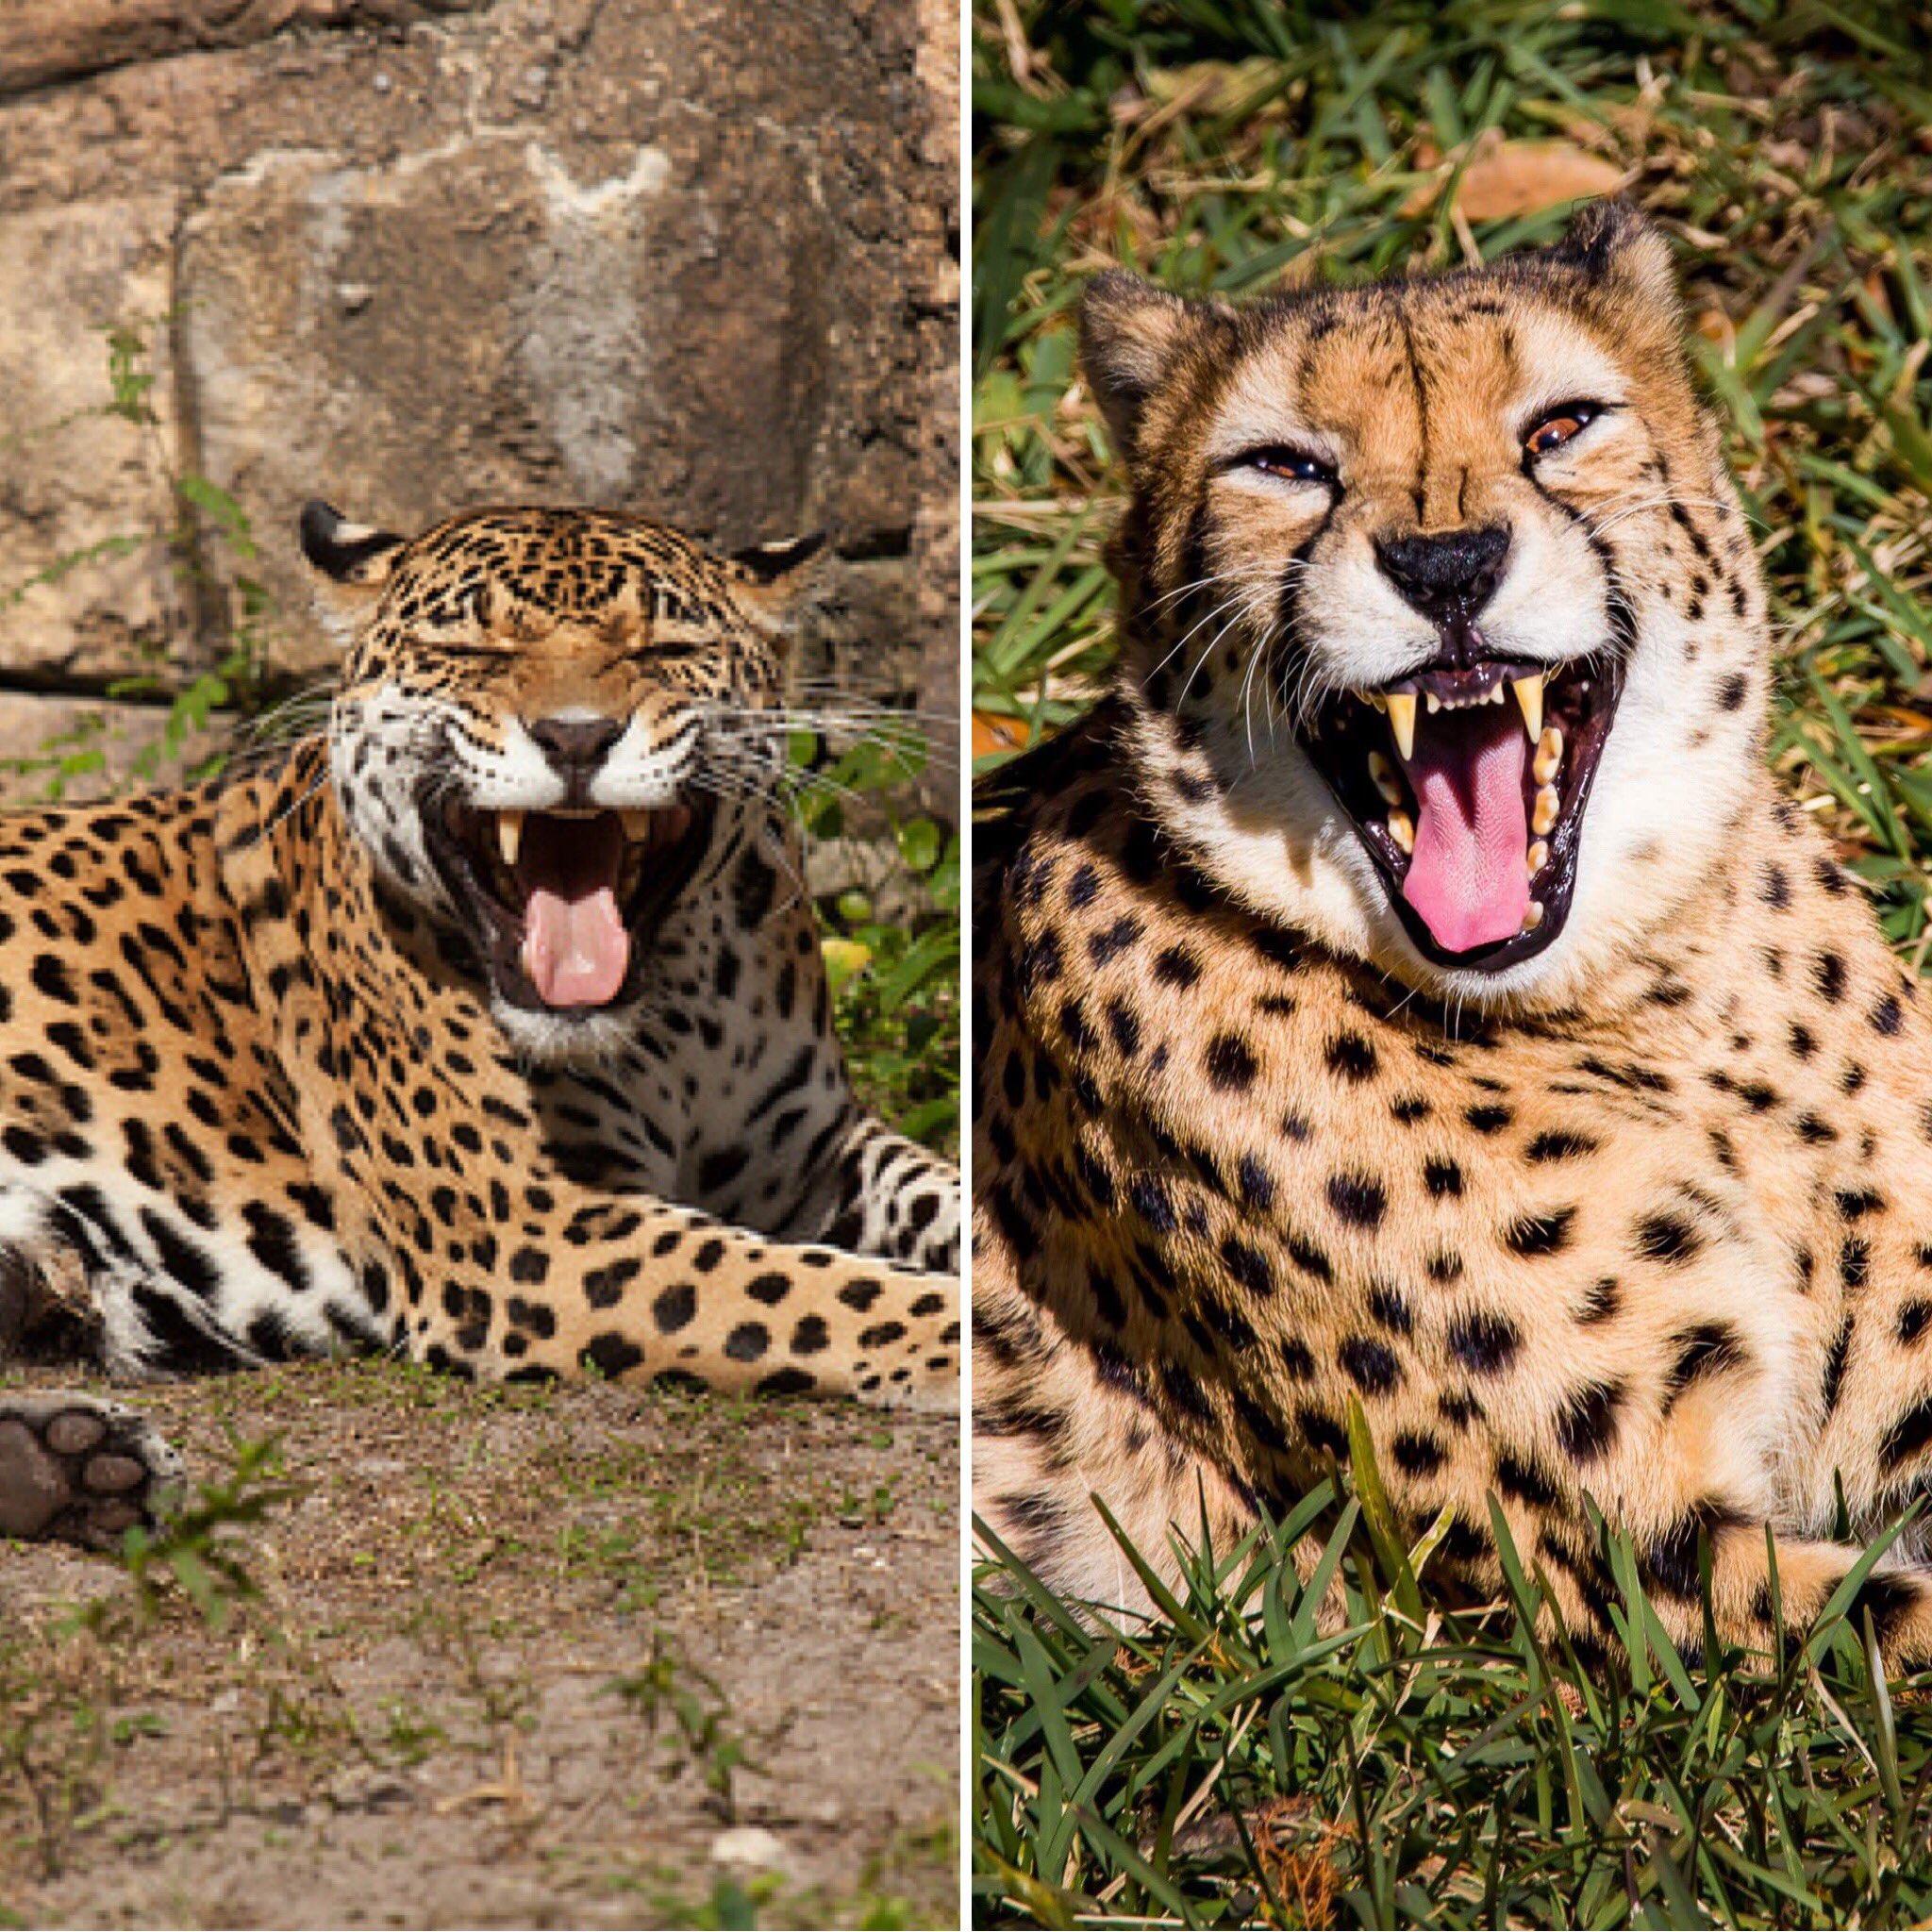 гепард и леопард разница фото сохранении архитектурного облика